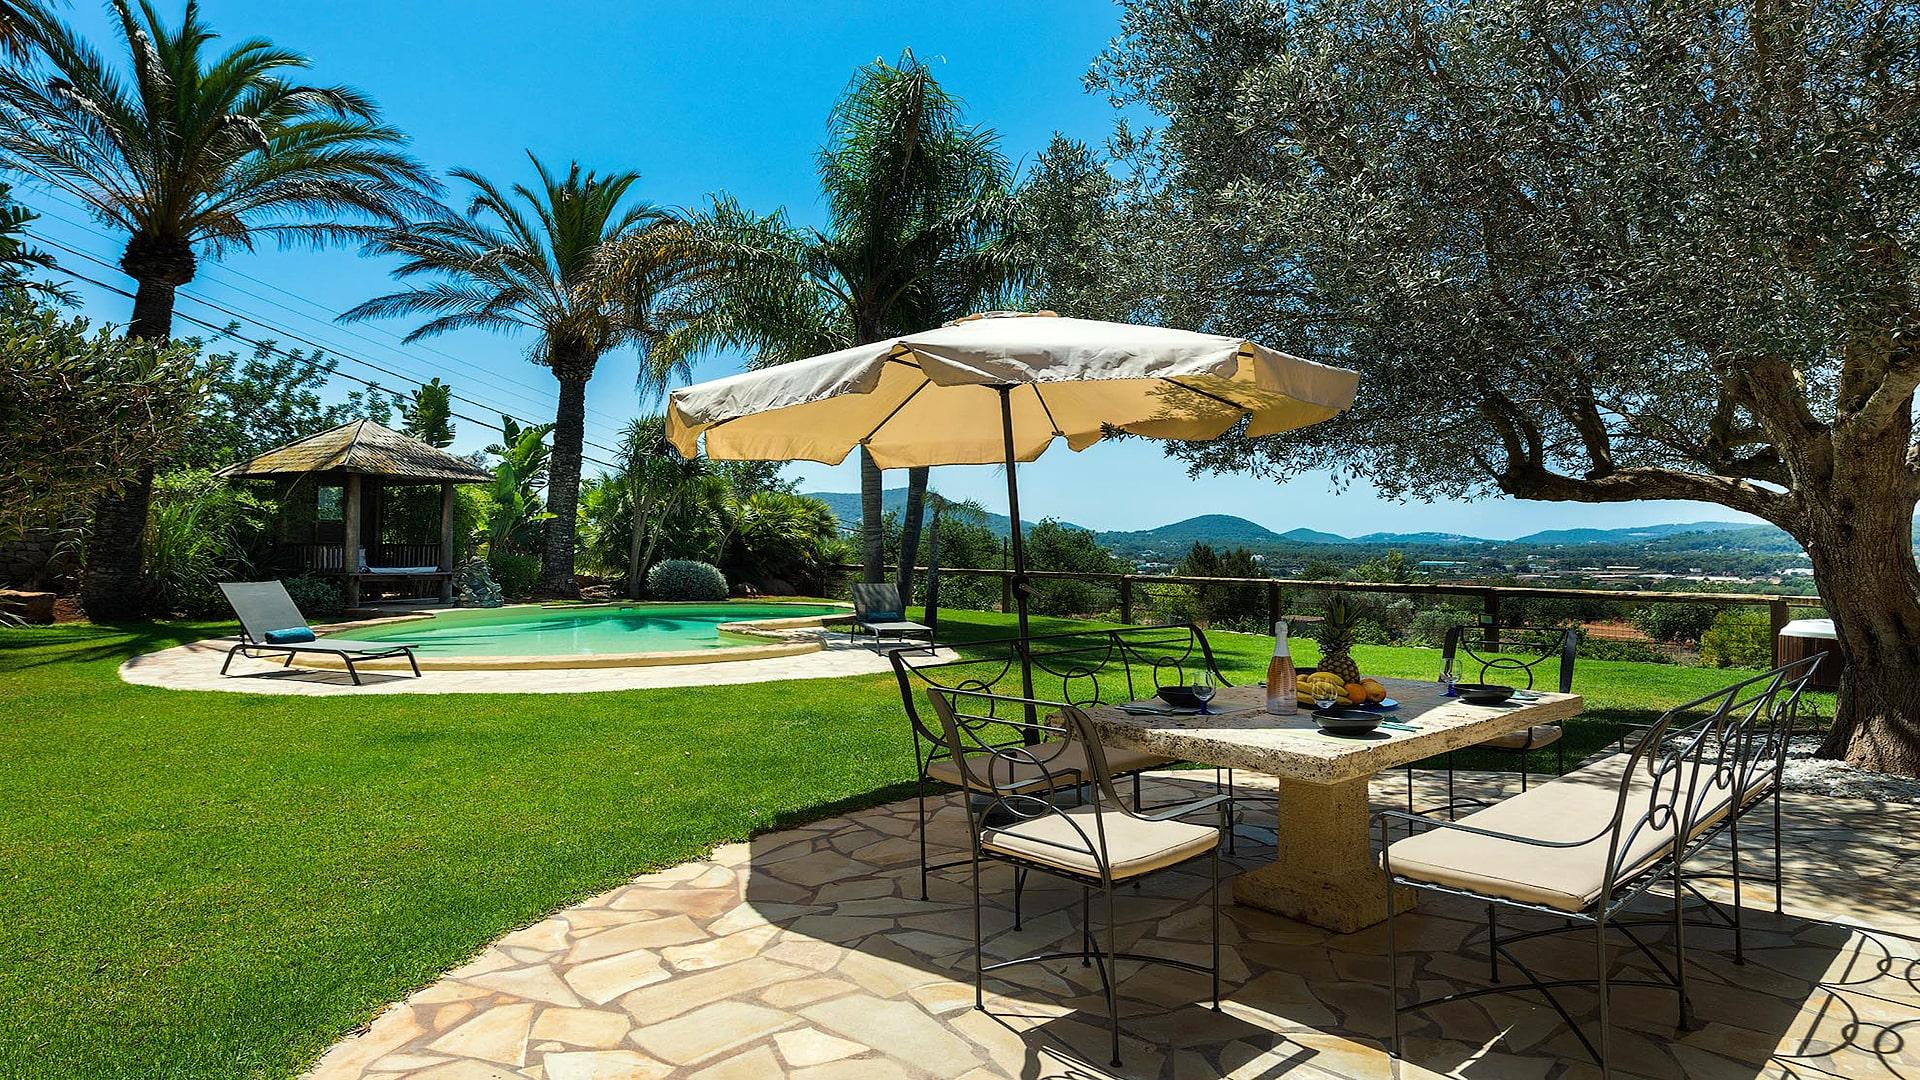 Casa Beni Ibiza 10 Santa Eulalia